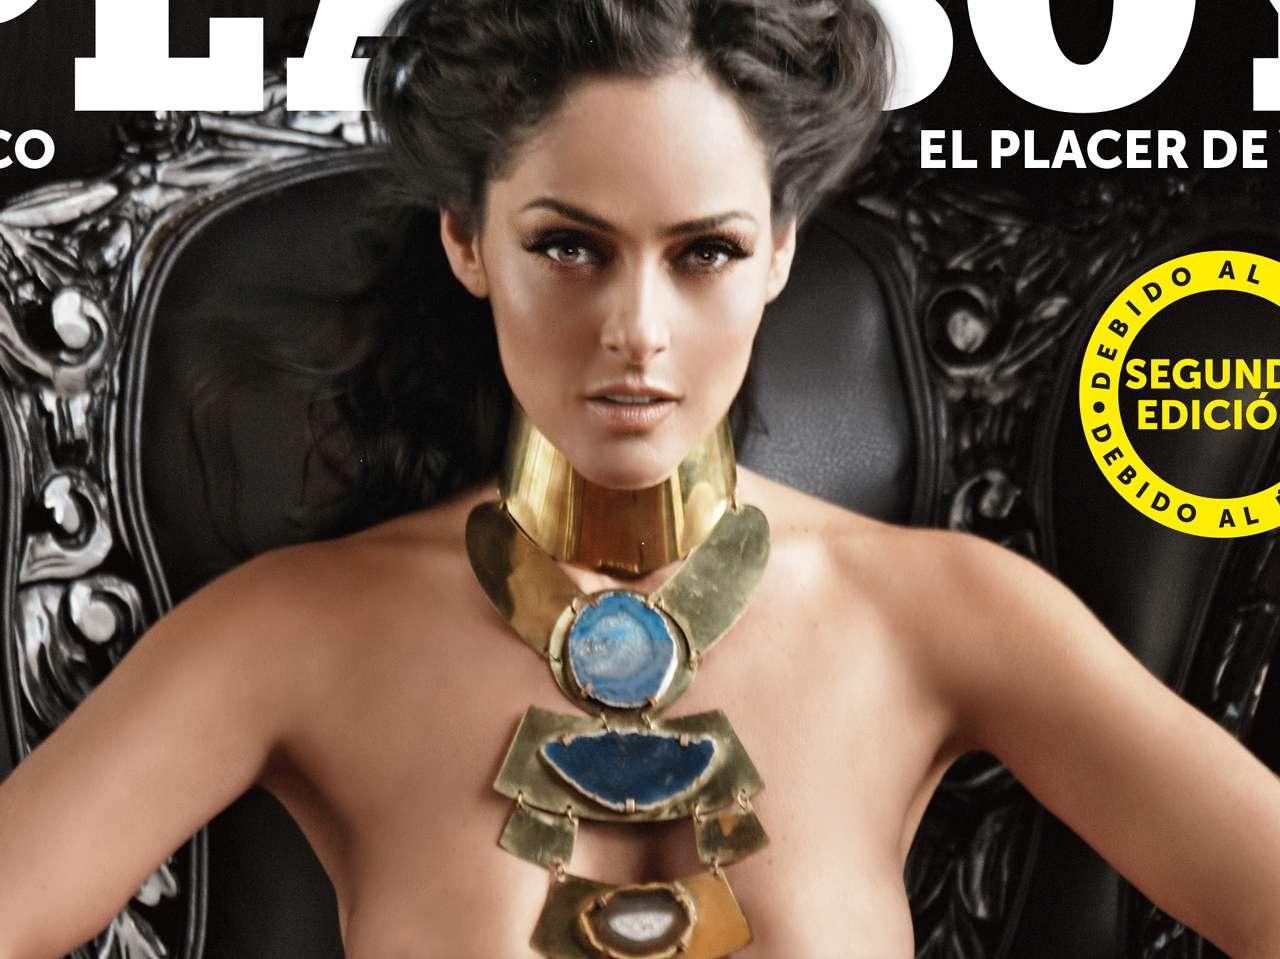 Andrea García - Portada Playboy. Foto: Playboy México